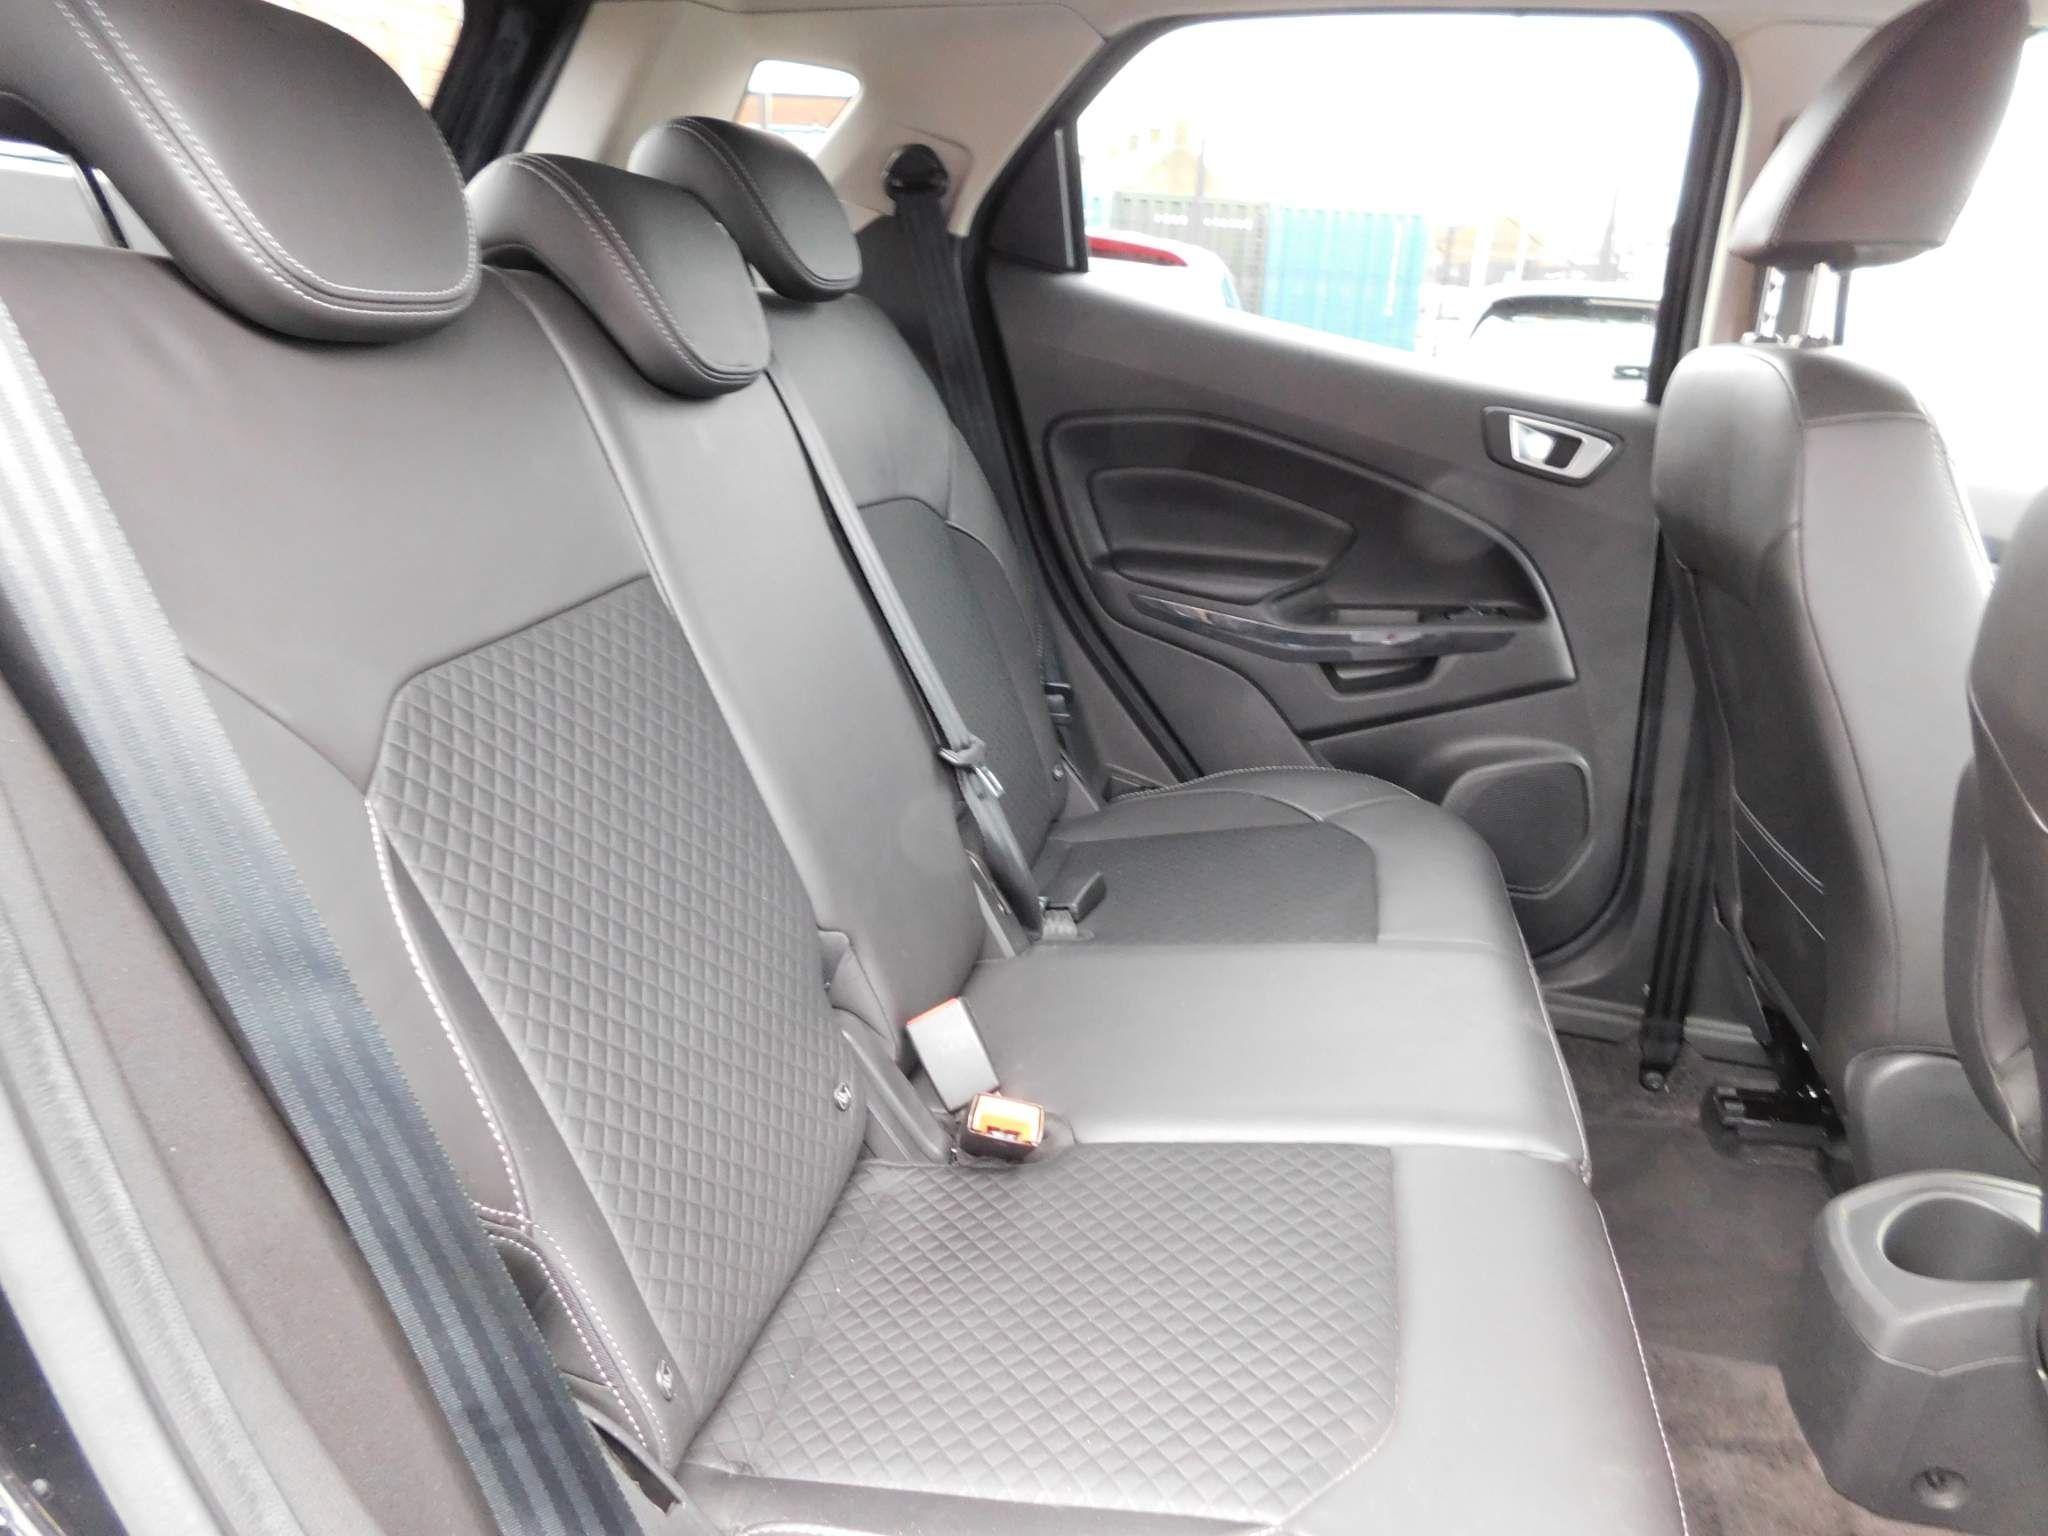 2018 FORD EcoSport 1.0T EcoBoost Titanium (s/s) Petrol Manual just in – Meadow Cars Carrickfergus full